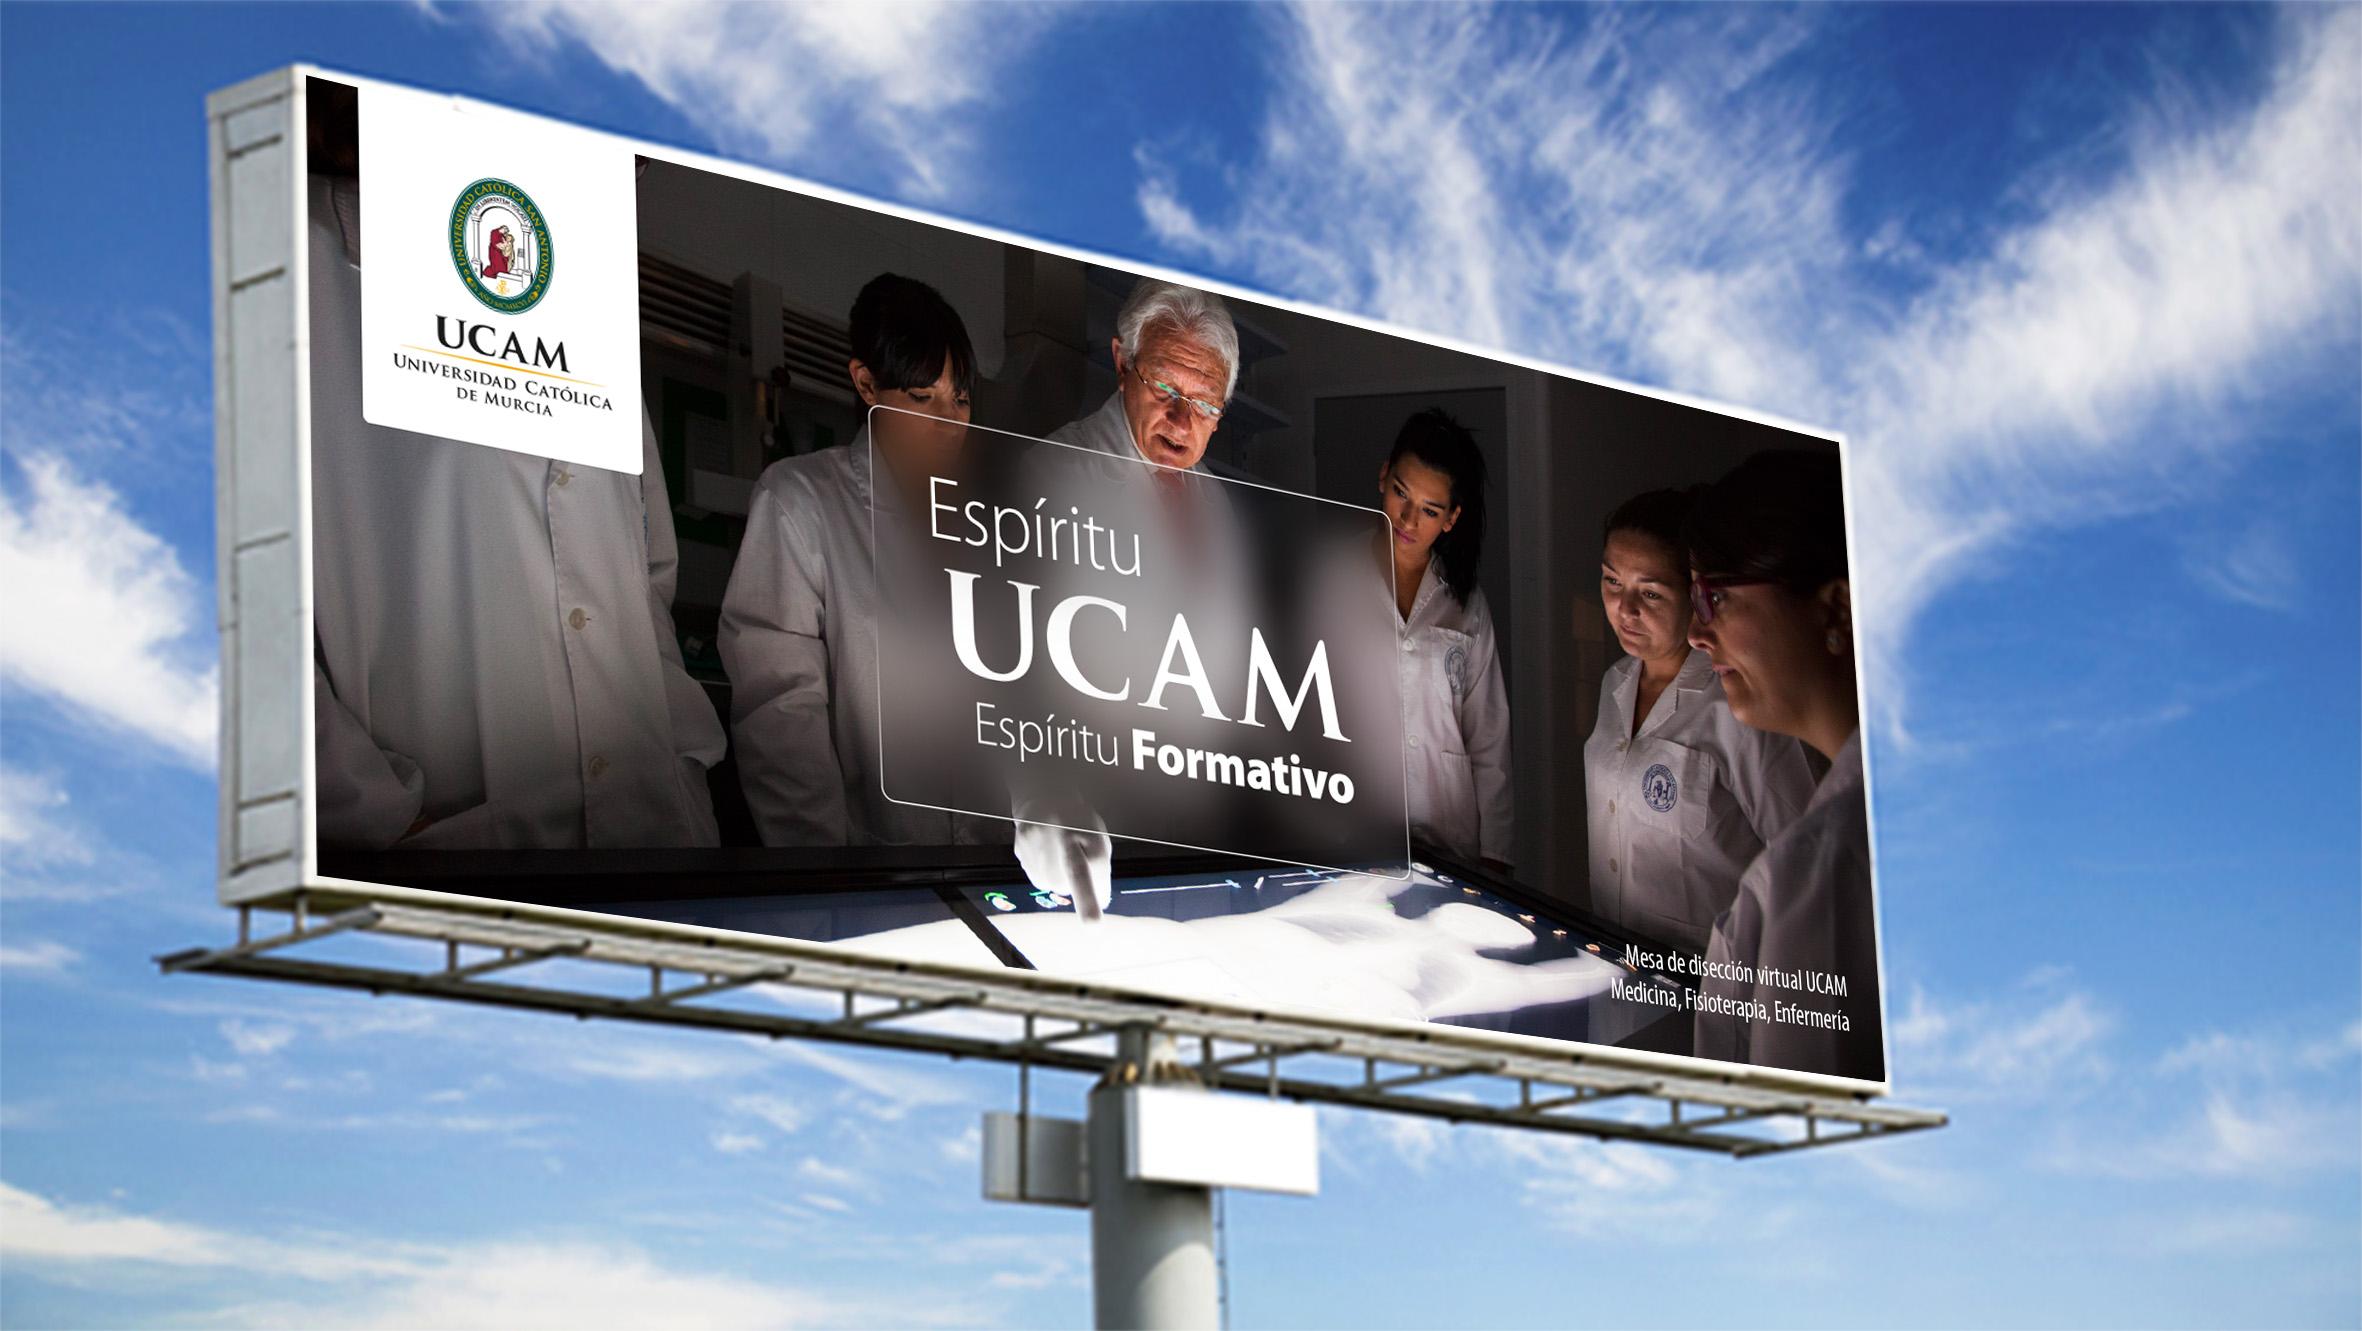 billboard formativo superimposed2.jpg